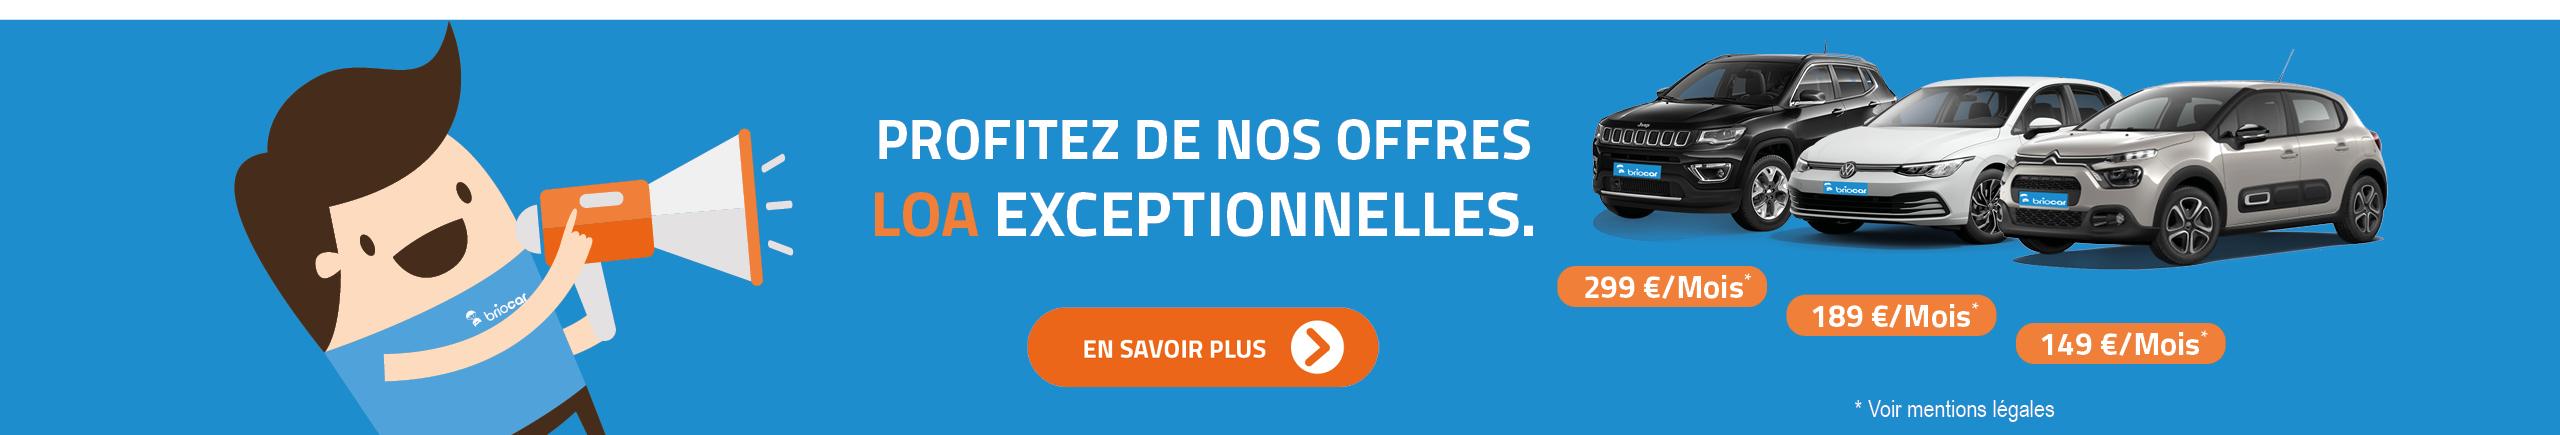 offres_loa_avril_2021_bandeau_blanc_opti.jpg